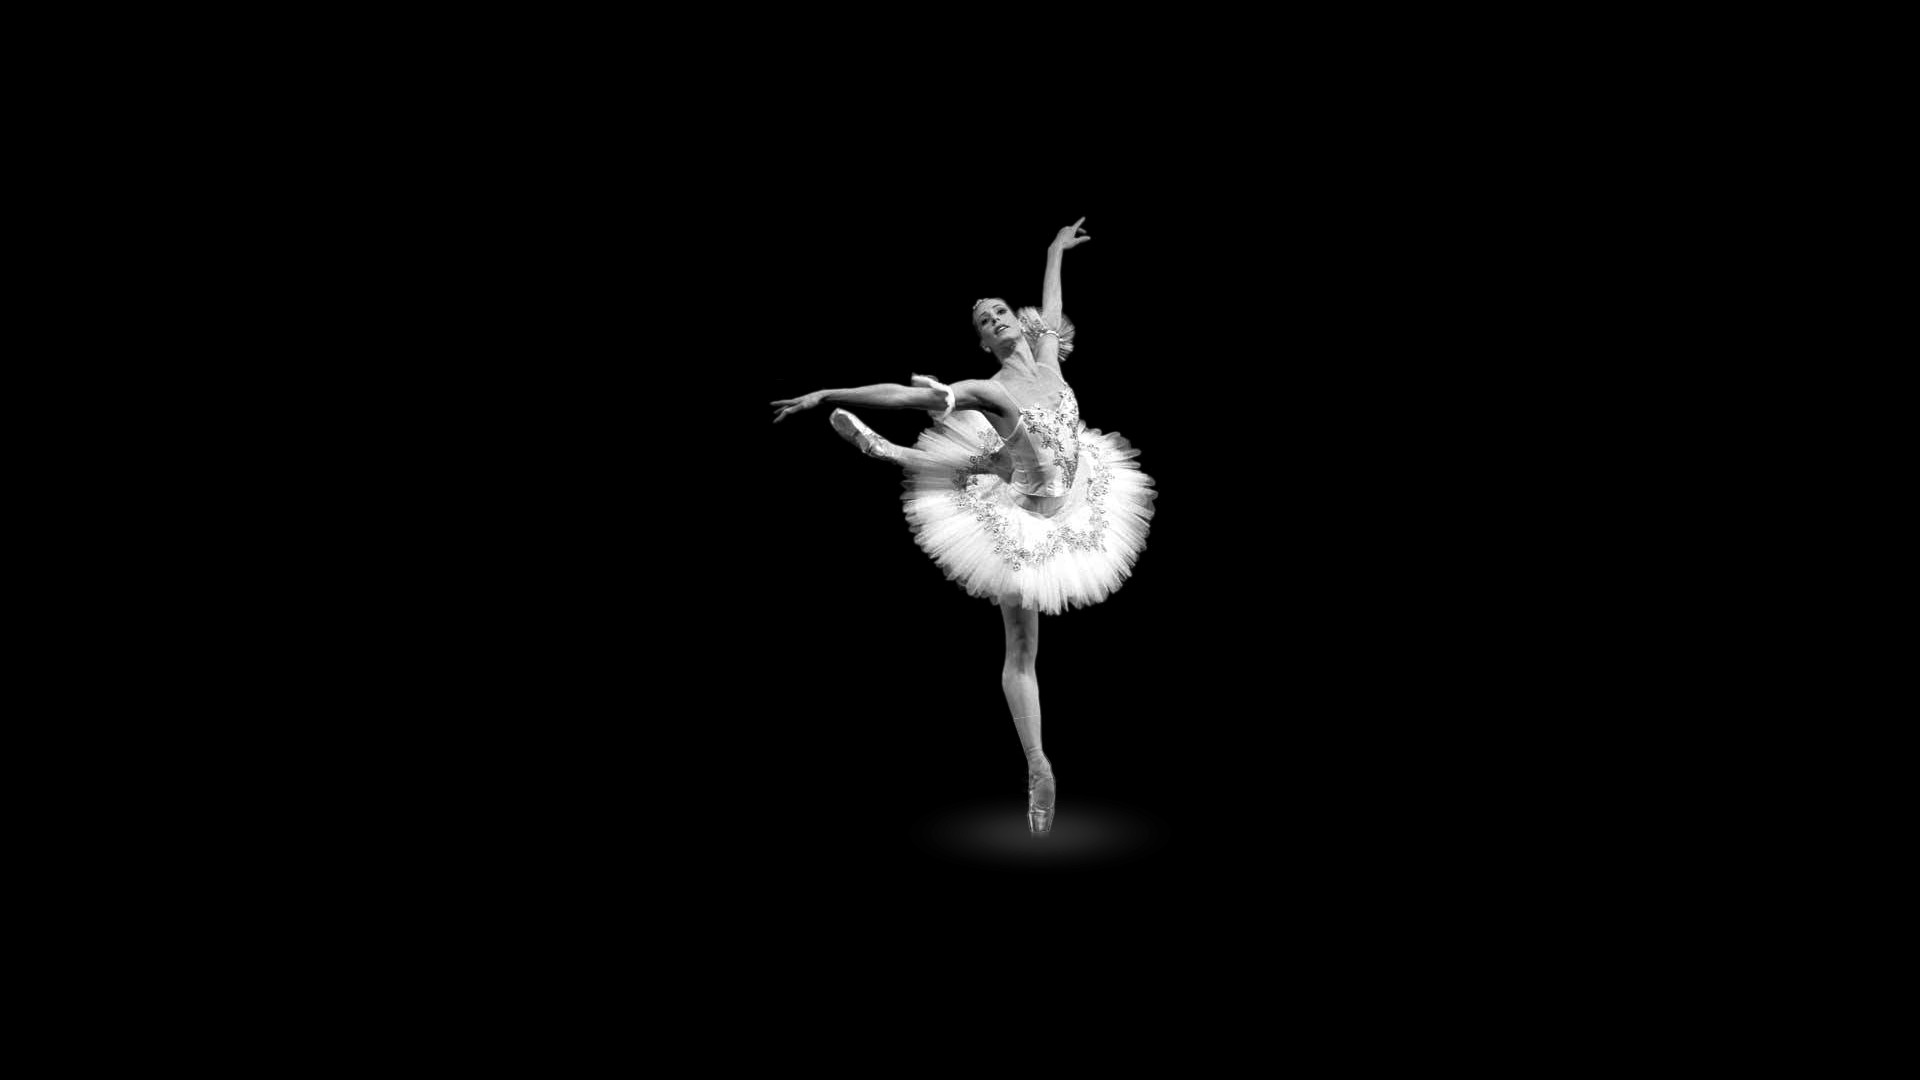 Ballet Dance Wallpapers Hd Dodskypict: Ballet Wallpapers (61+ Images